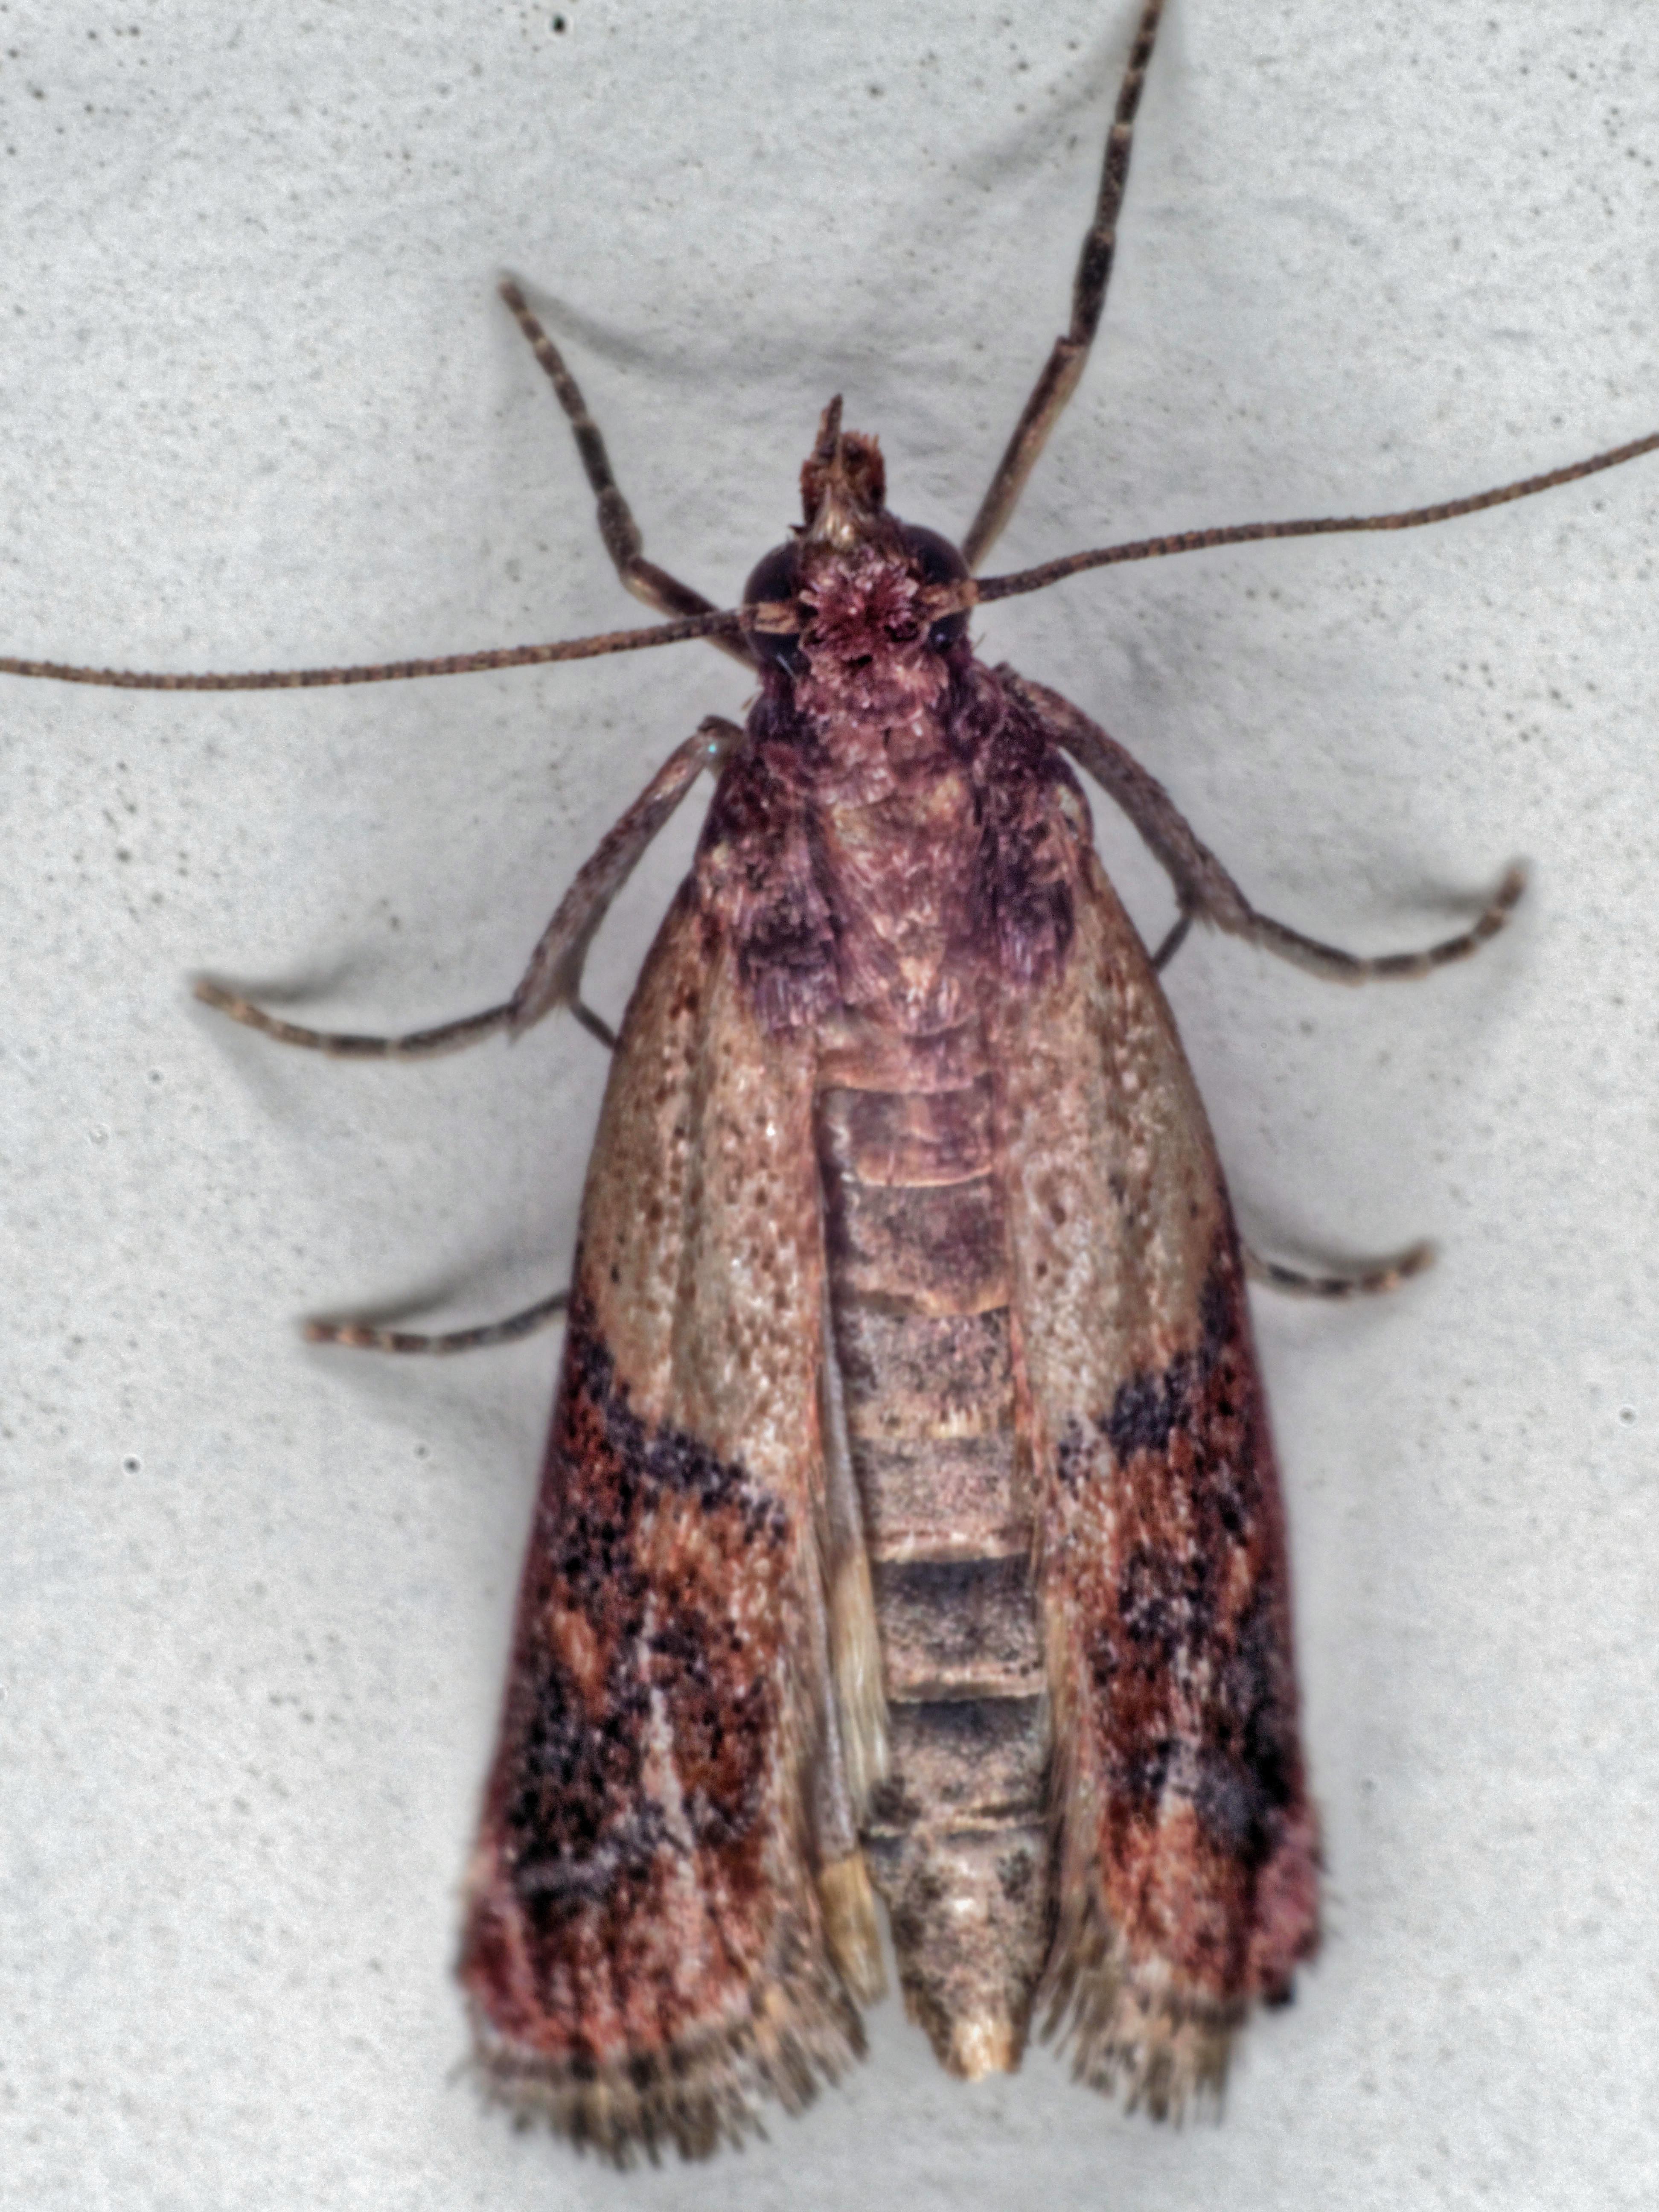 Indianmeal-moth-4.jpeg